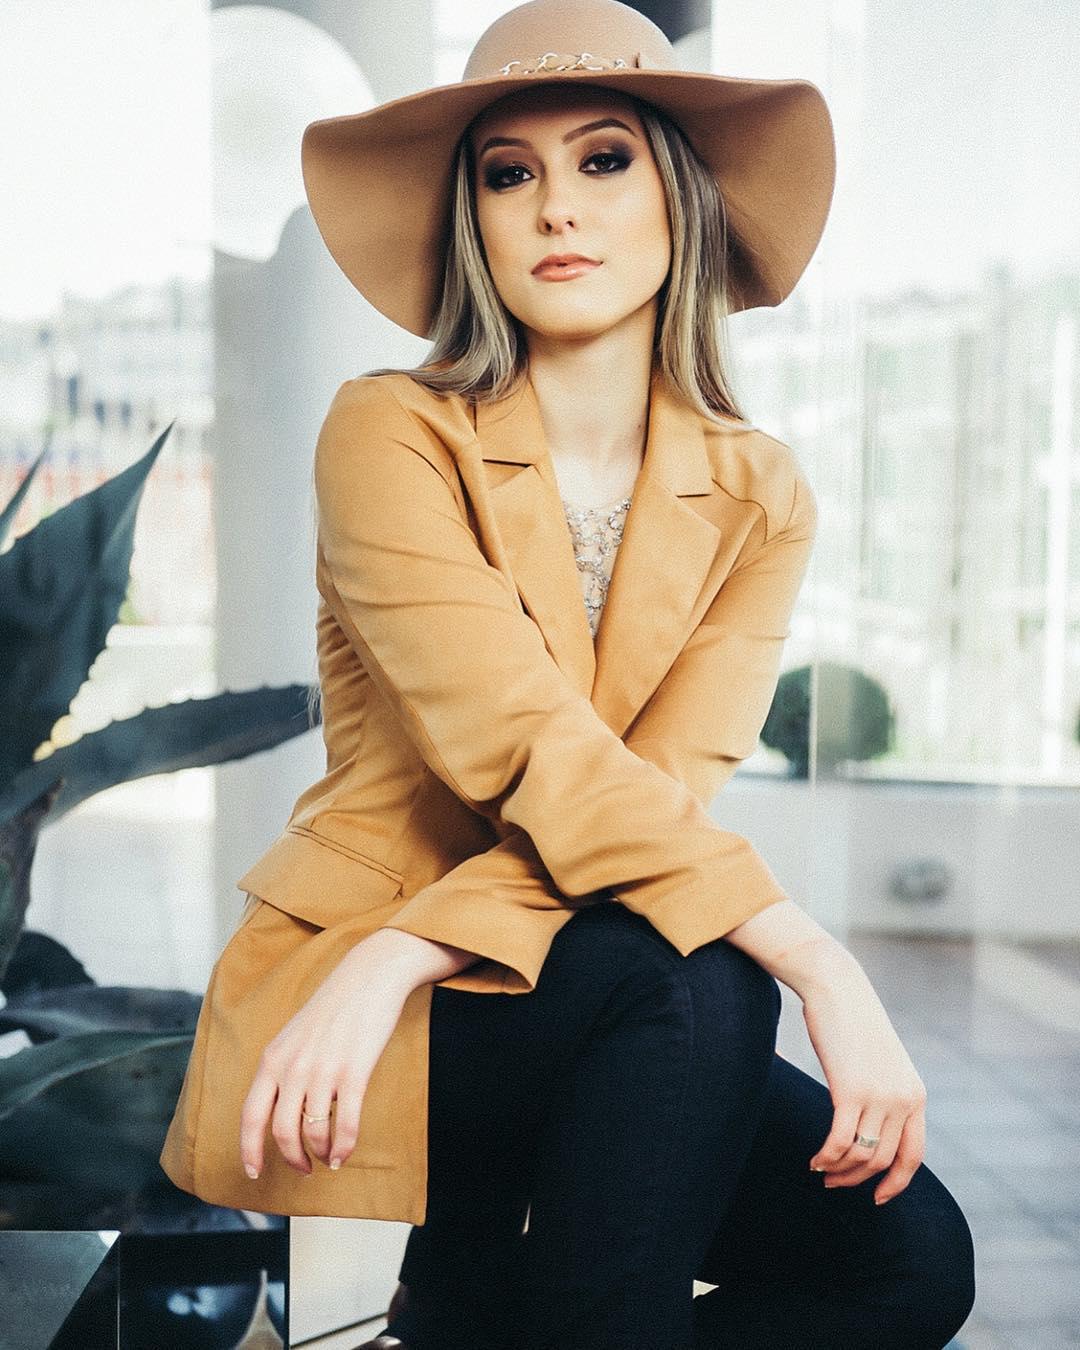 cristine boff sartor, segunda finalista de miss latinoamerica 2019. 22860210